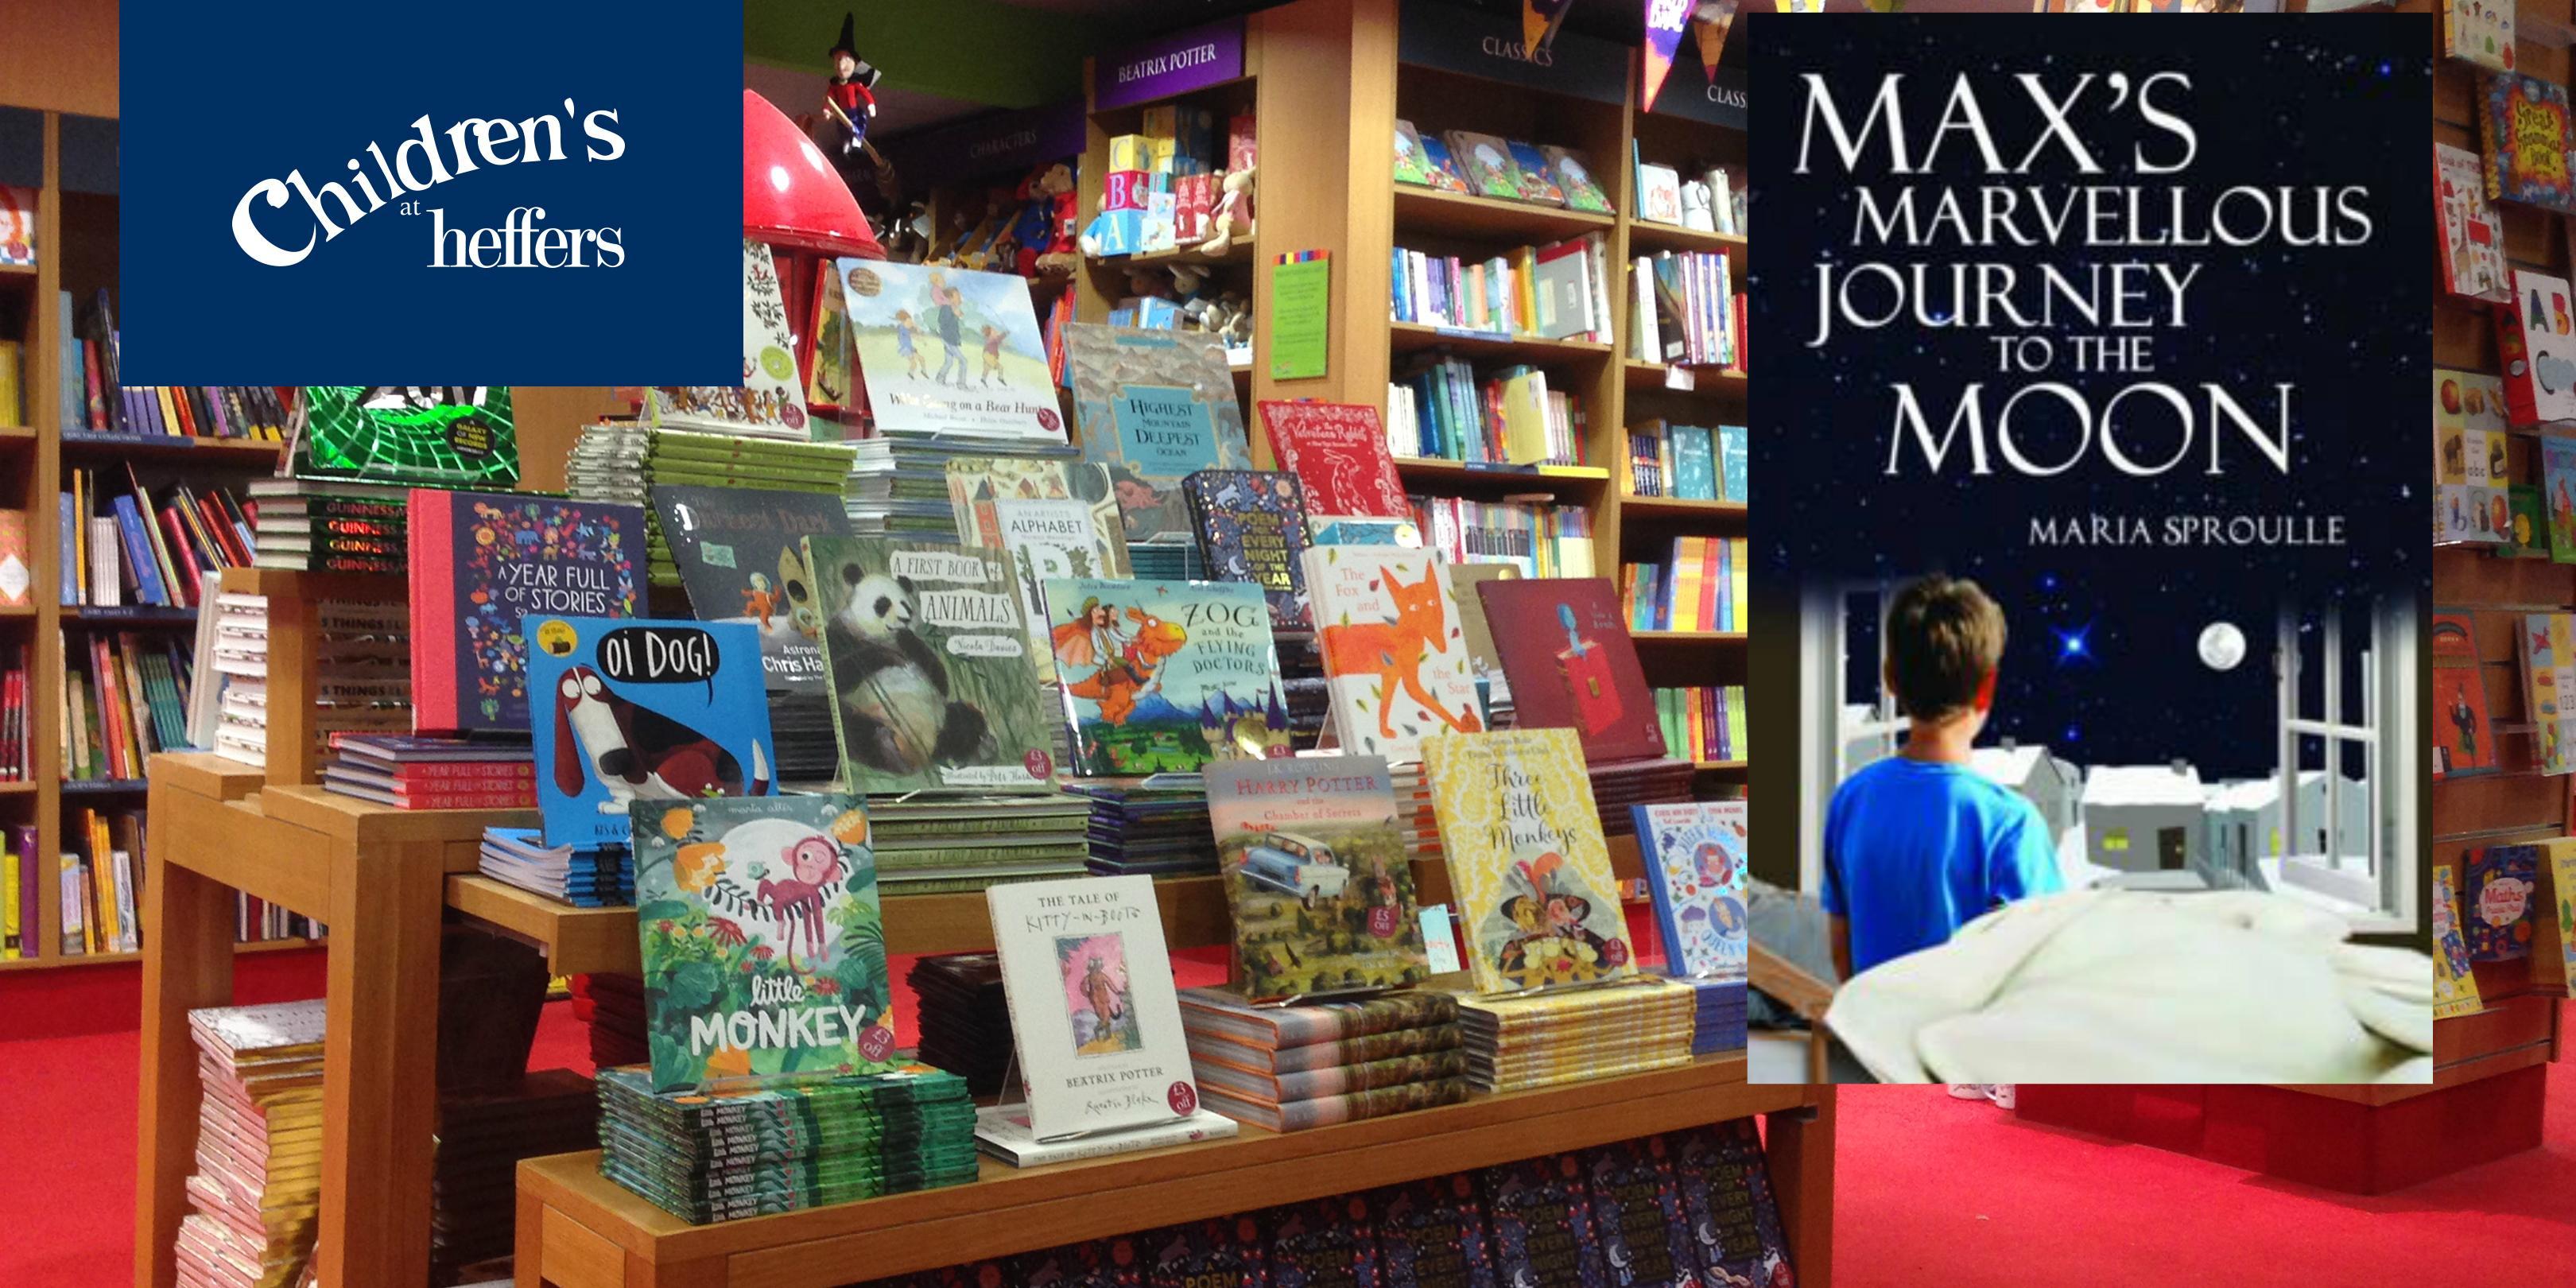 Half Term at Heffers! Max's Marvellous Journe